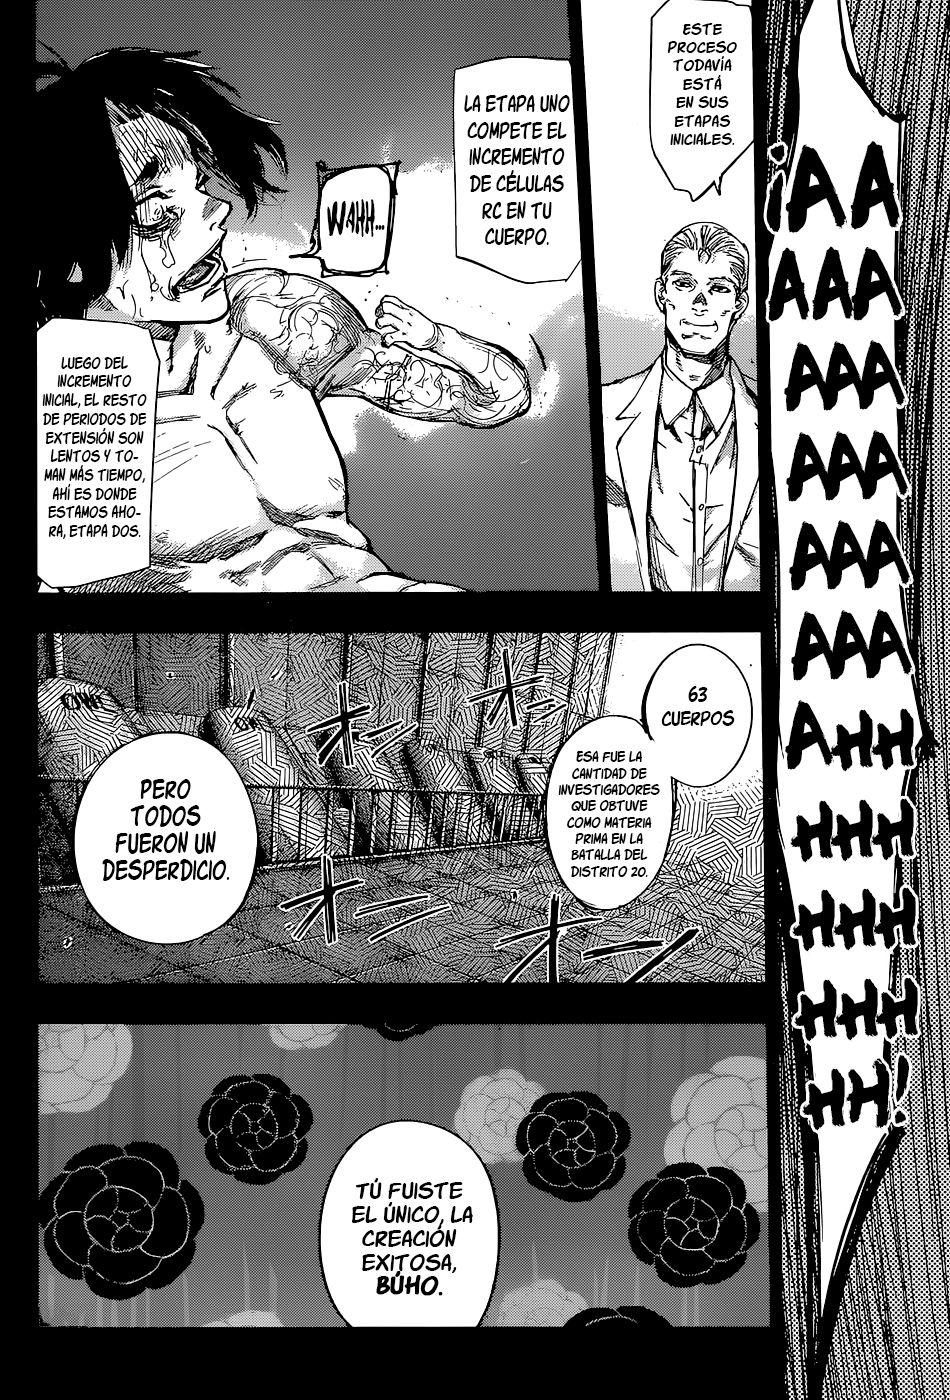 https://c5.ninemanga.com/es_manga/pic2/59/59/494698/a037f73986ee673263e5140067d9914c.jpg Page 7